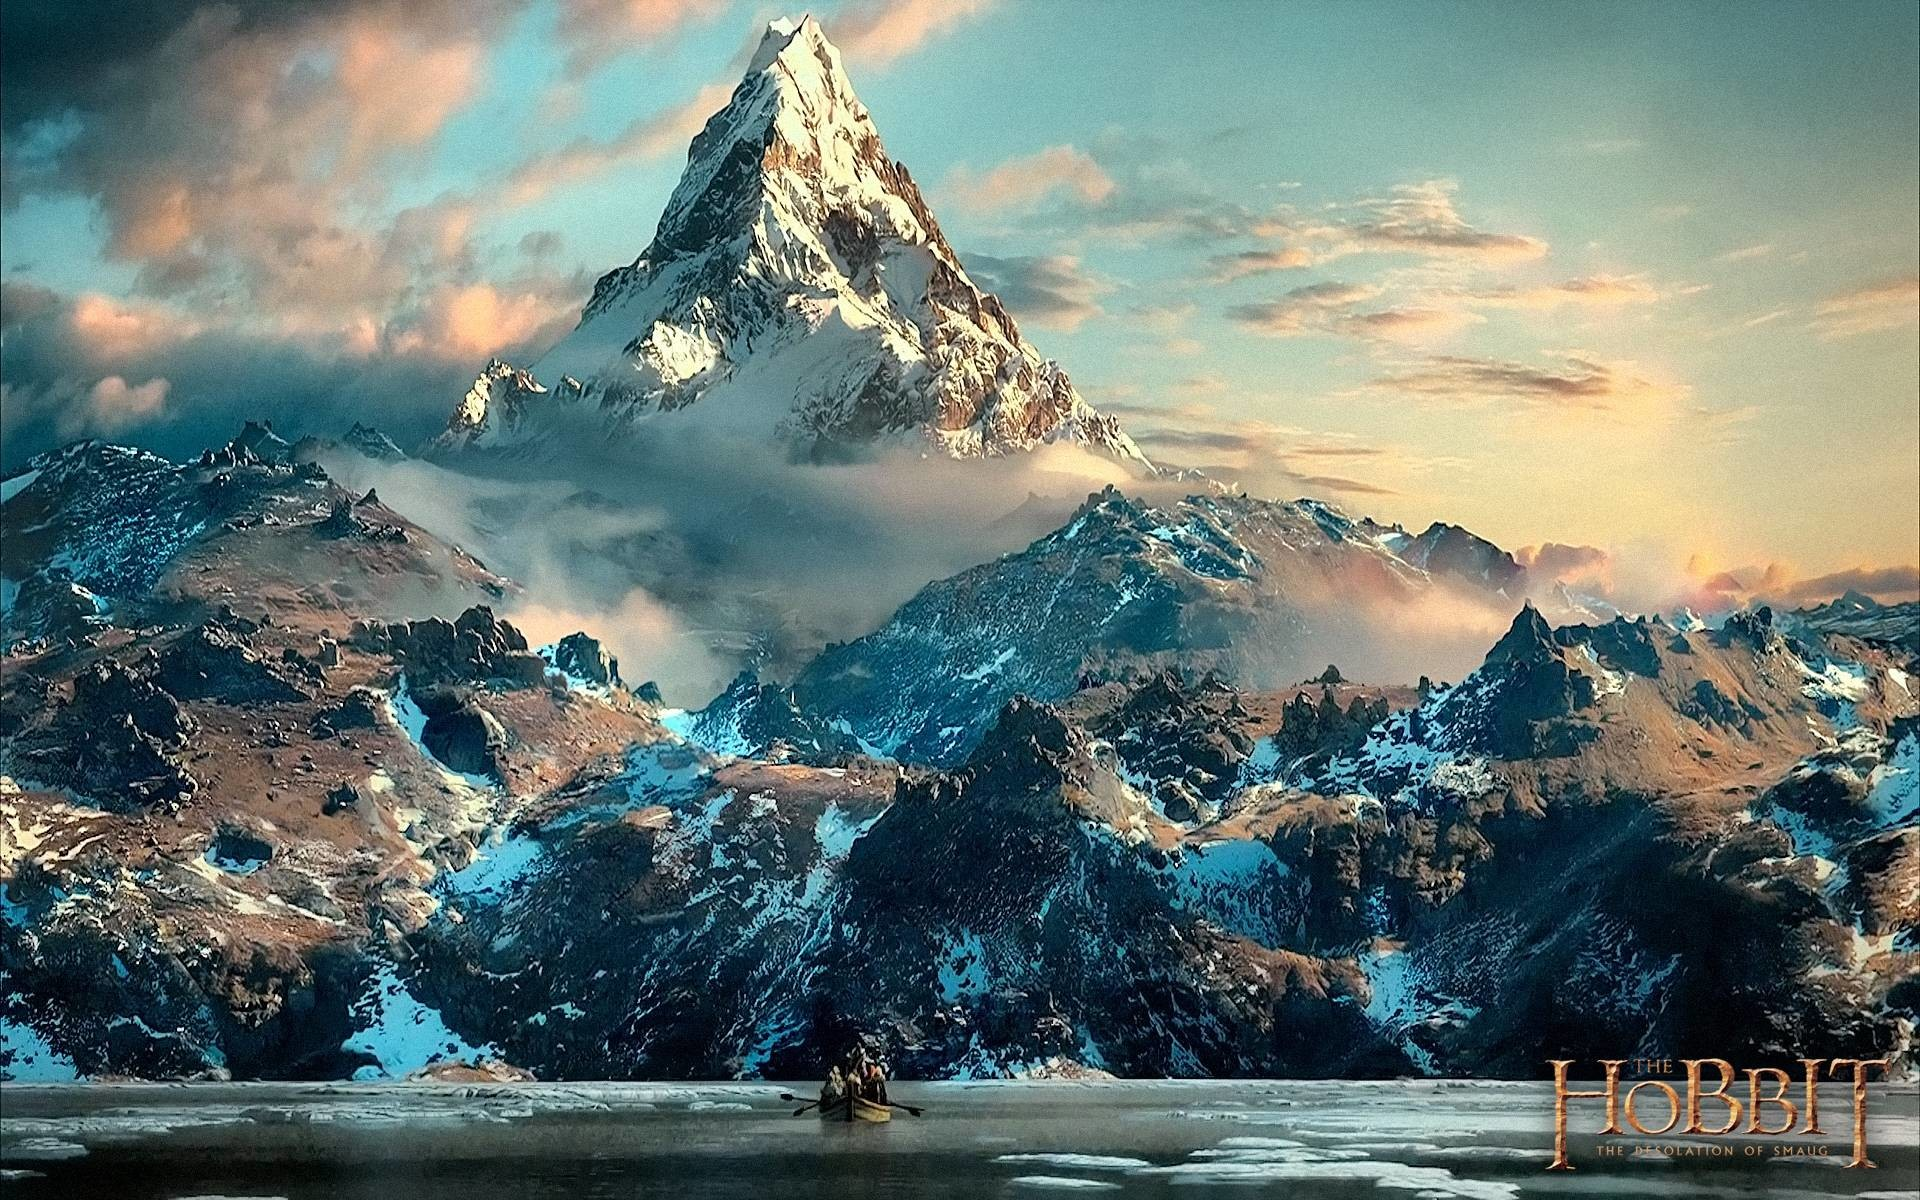 Wallpaper. Wiki-the-hobbit-movie-wallpaper-hd-1080p-pic-wpe0014522.